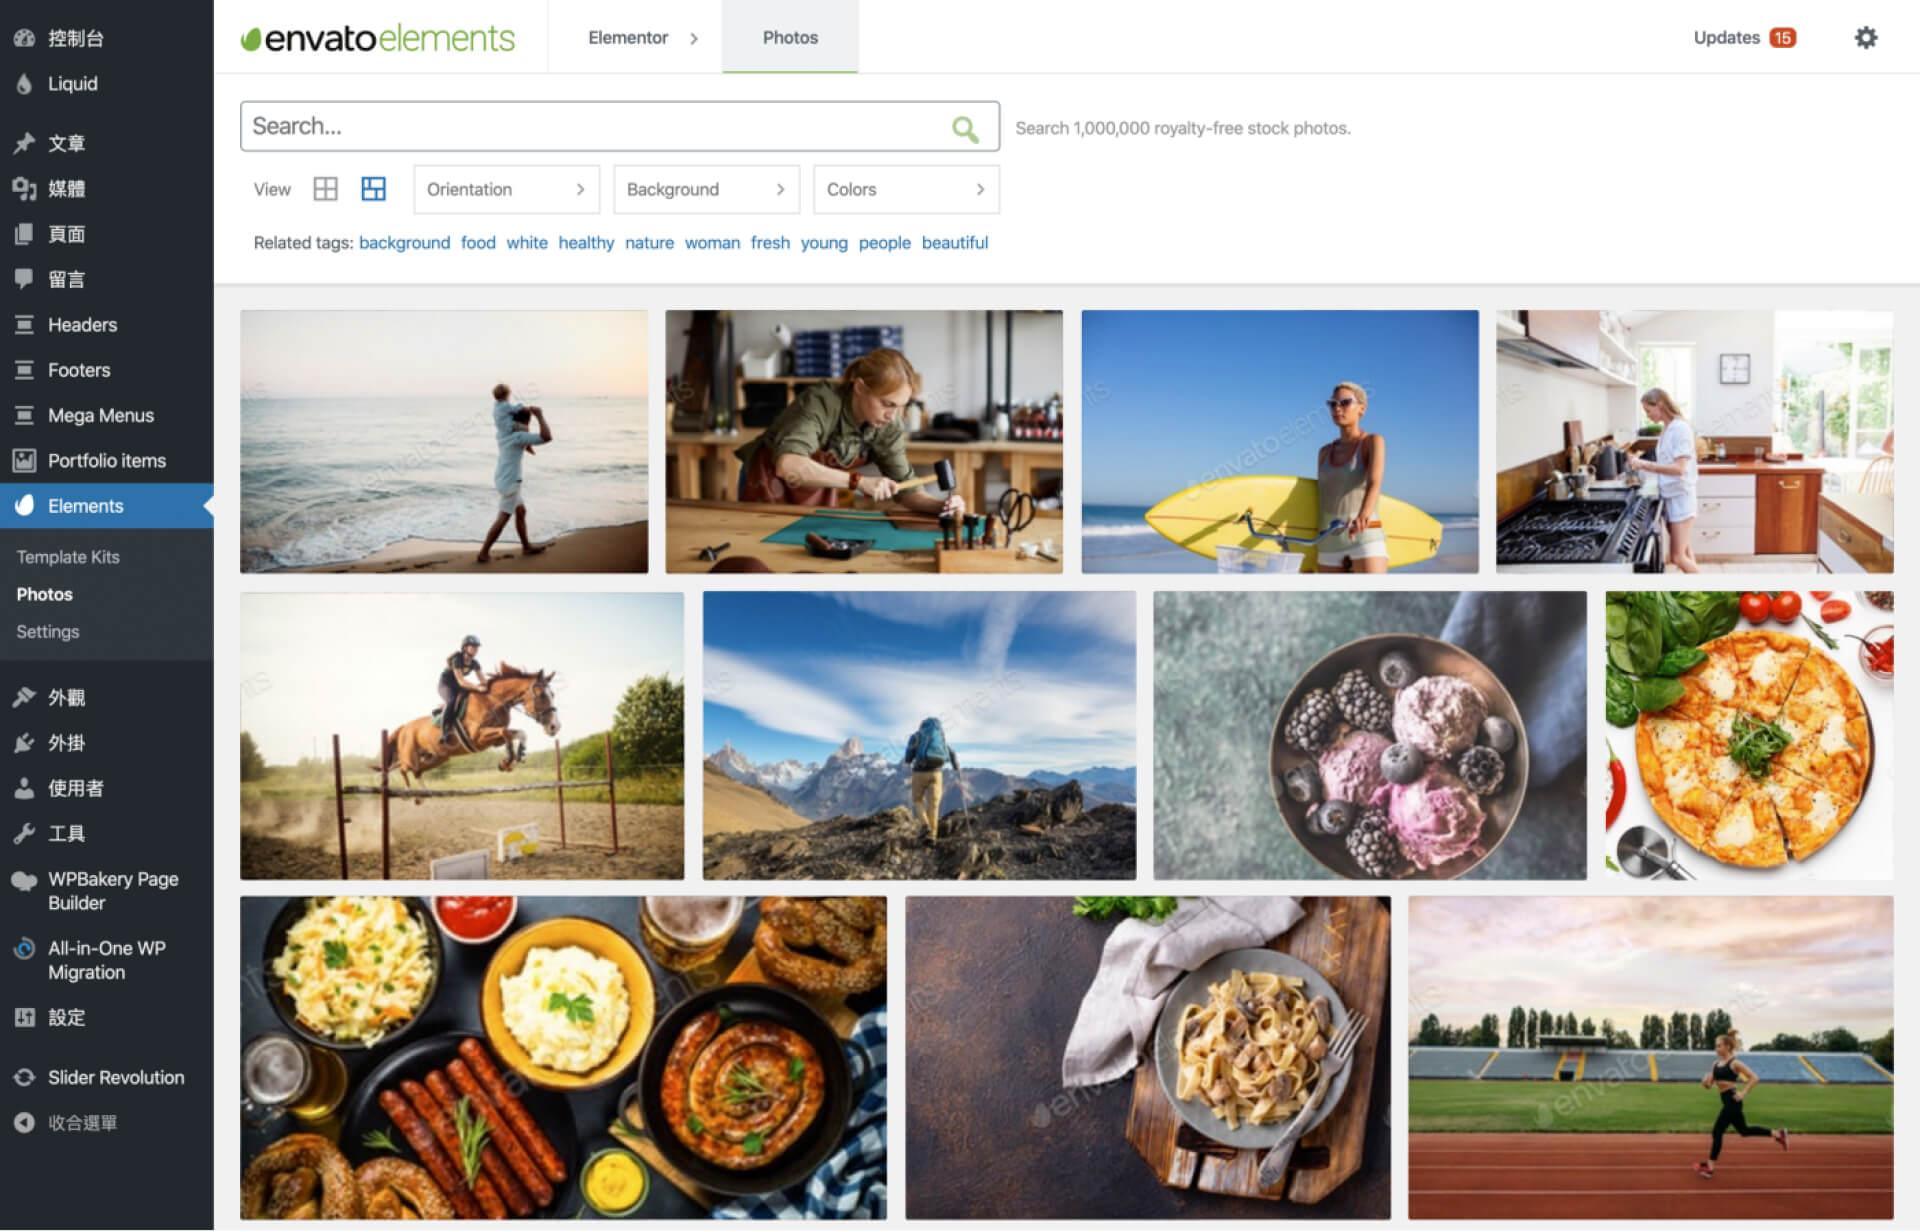 Envato Elements — Photos & Elementor Templates 外掛設定介面 — 圖庫瀏覽-IrvingLab 爾文實驗室